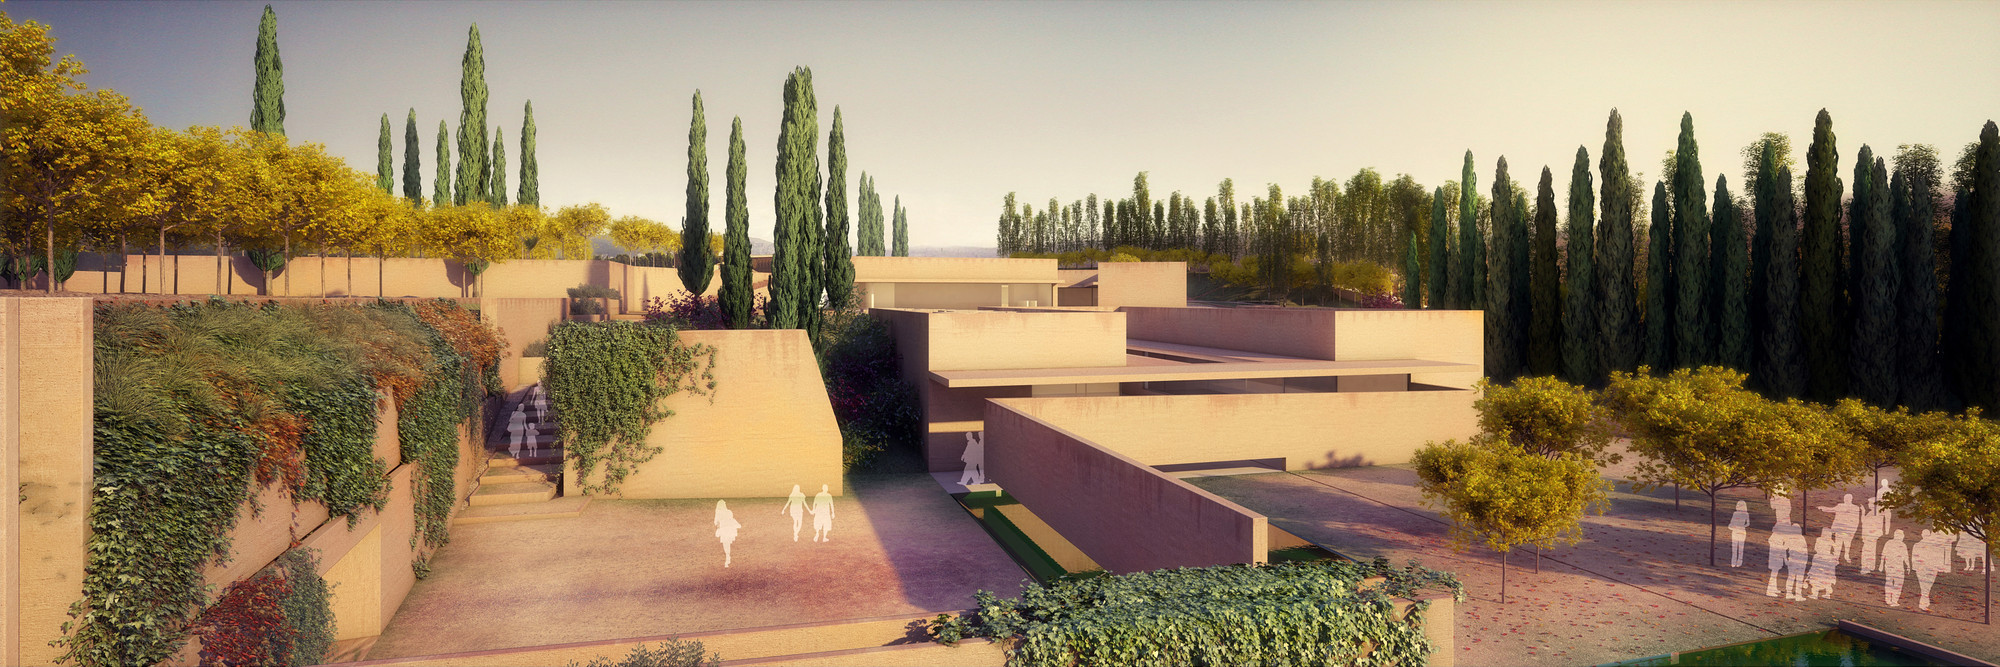 "Álvaro Siza + Juan Domingo Santos Design ""New Gate of Alhambra"", Alhambra Atrium I Ivy Courtyard (Northwest Landscape View). Image © Alvaro Siza Vieira + Juan Domingo Santos; Rendering by LT Studios"